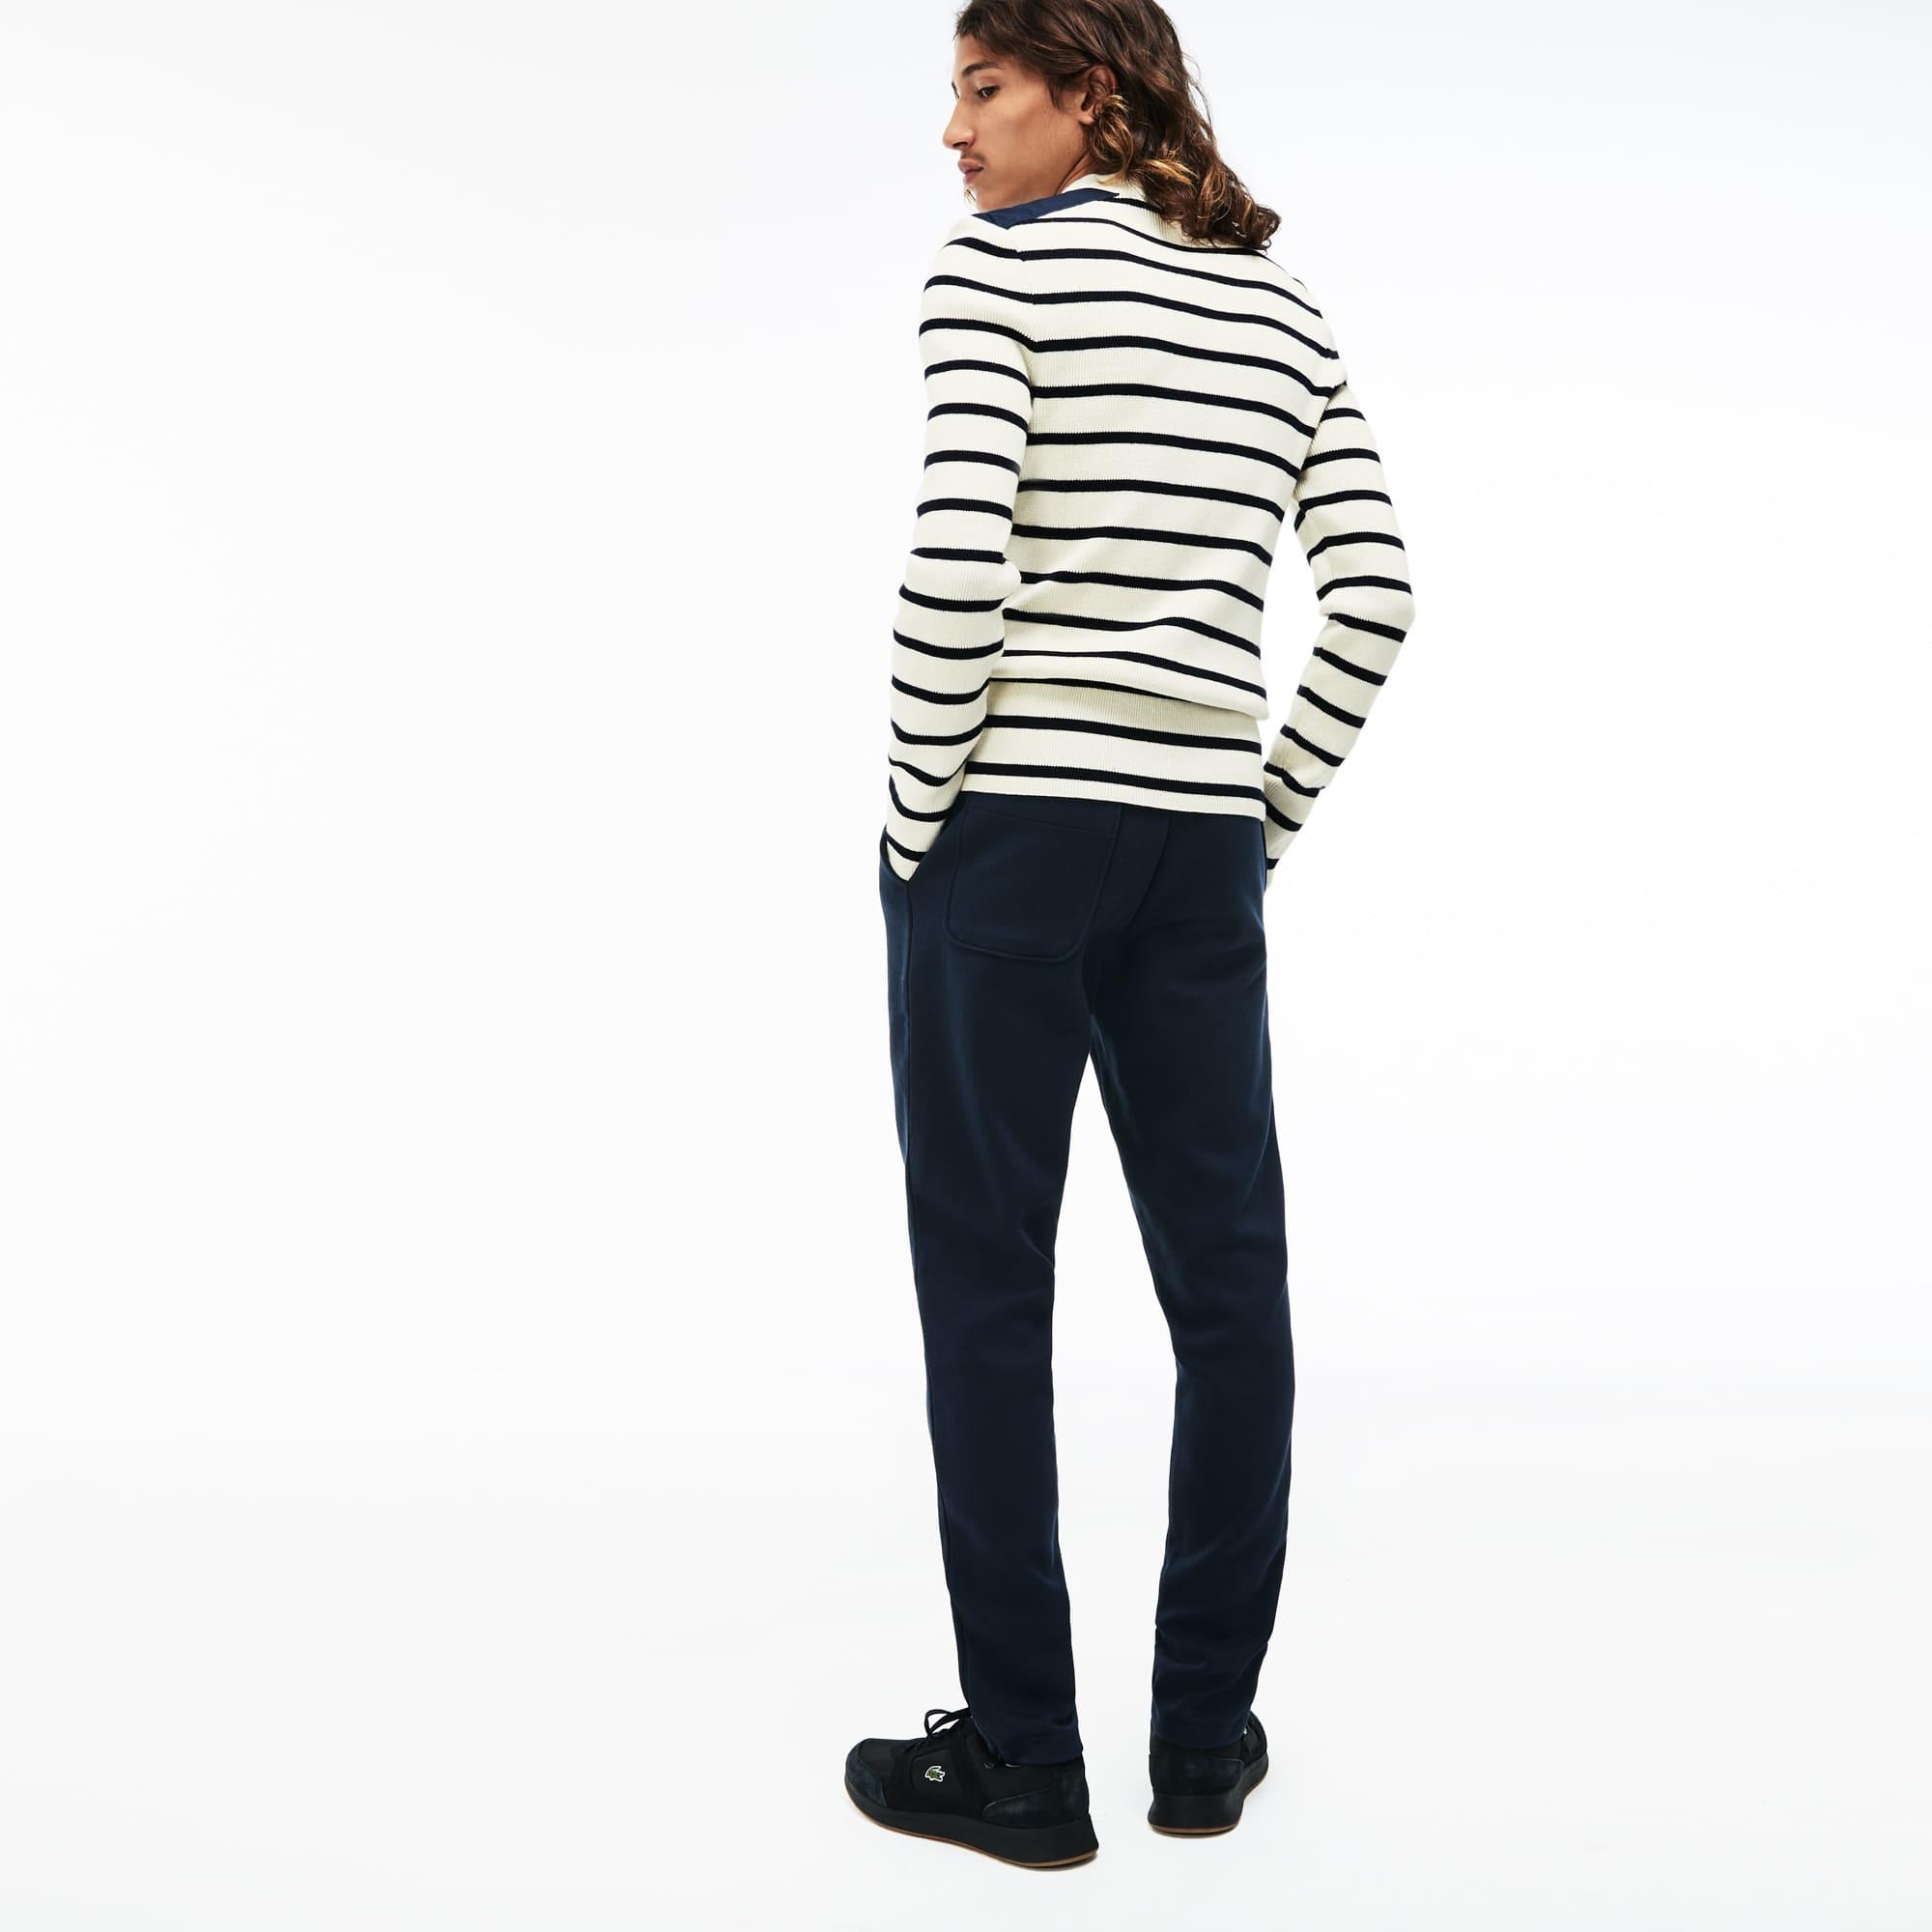 Men's LIVE Crew Neck Striped Interlock Sweater